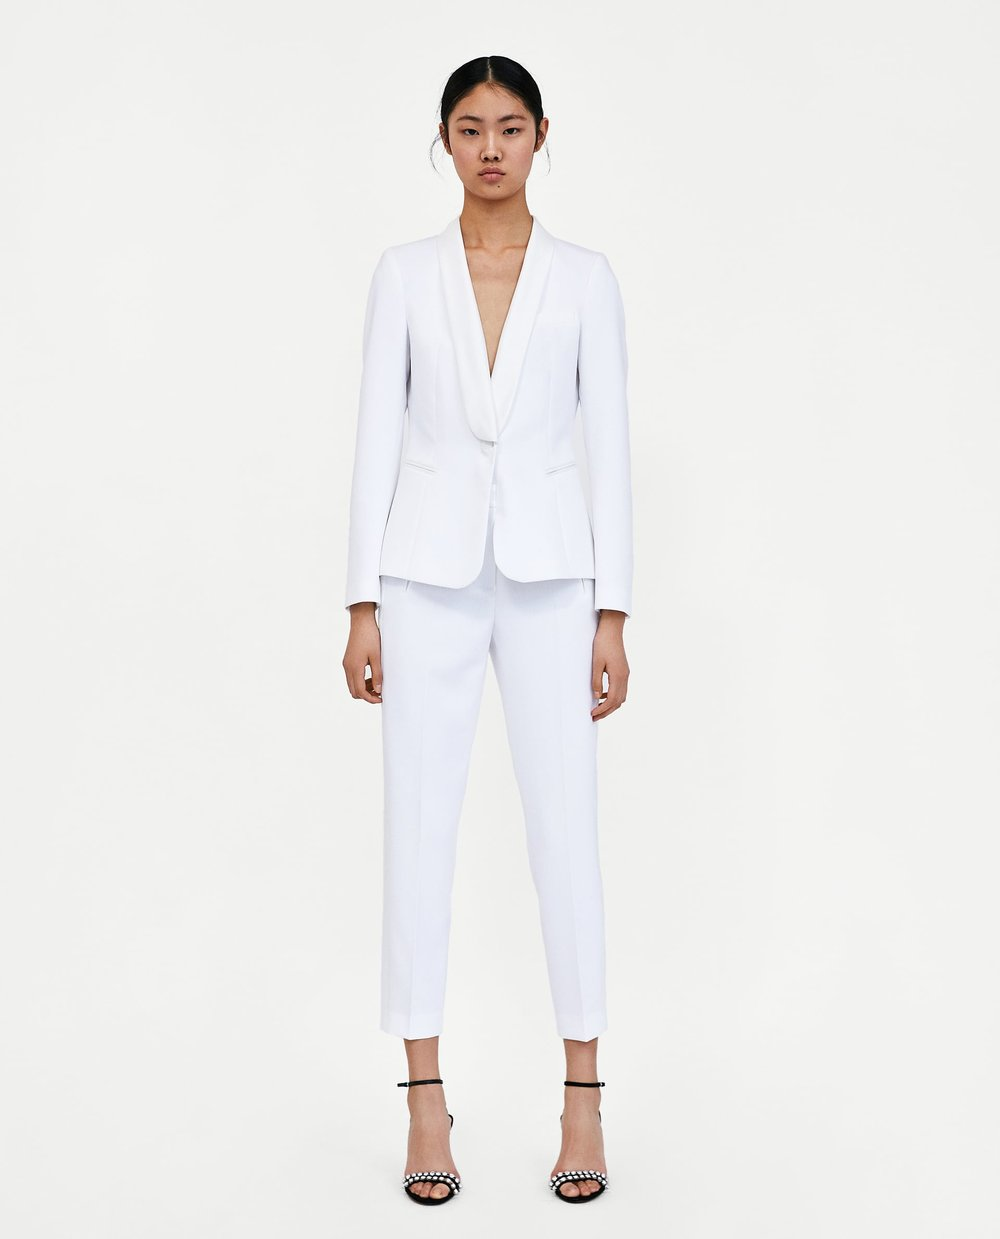 Zara_white tuxedo blazer.jpg